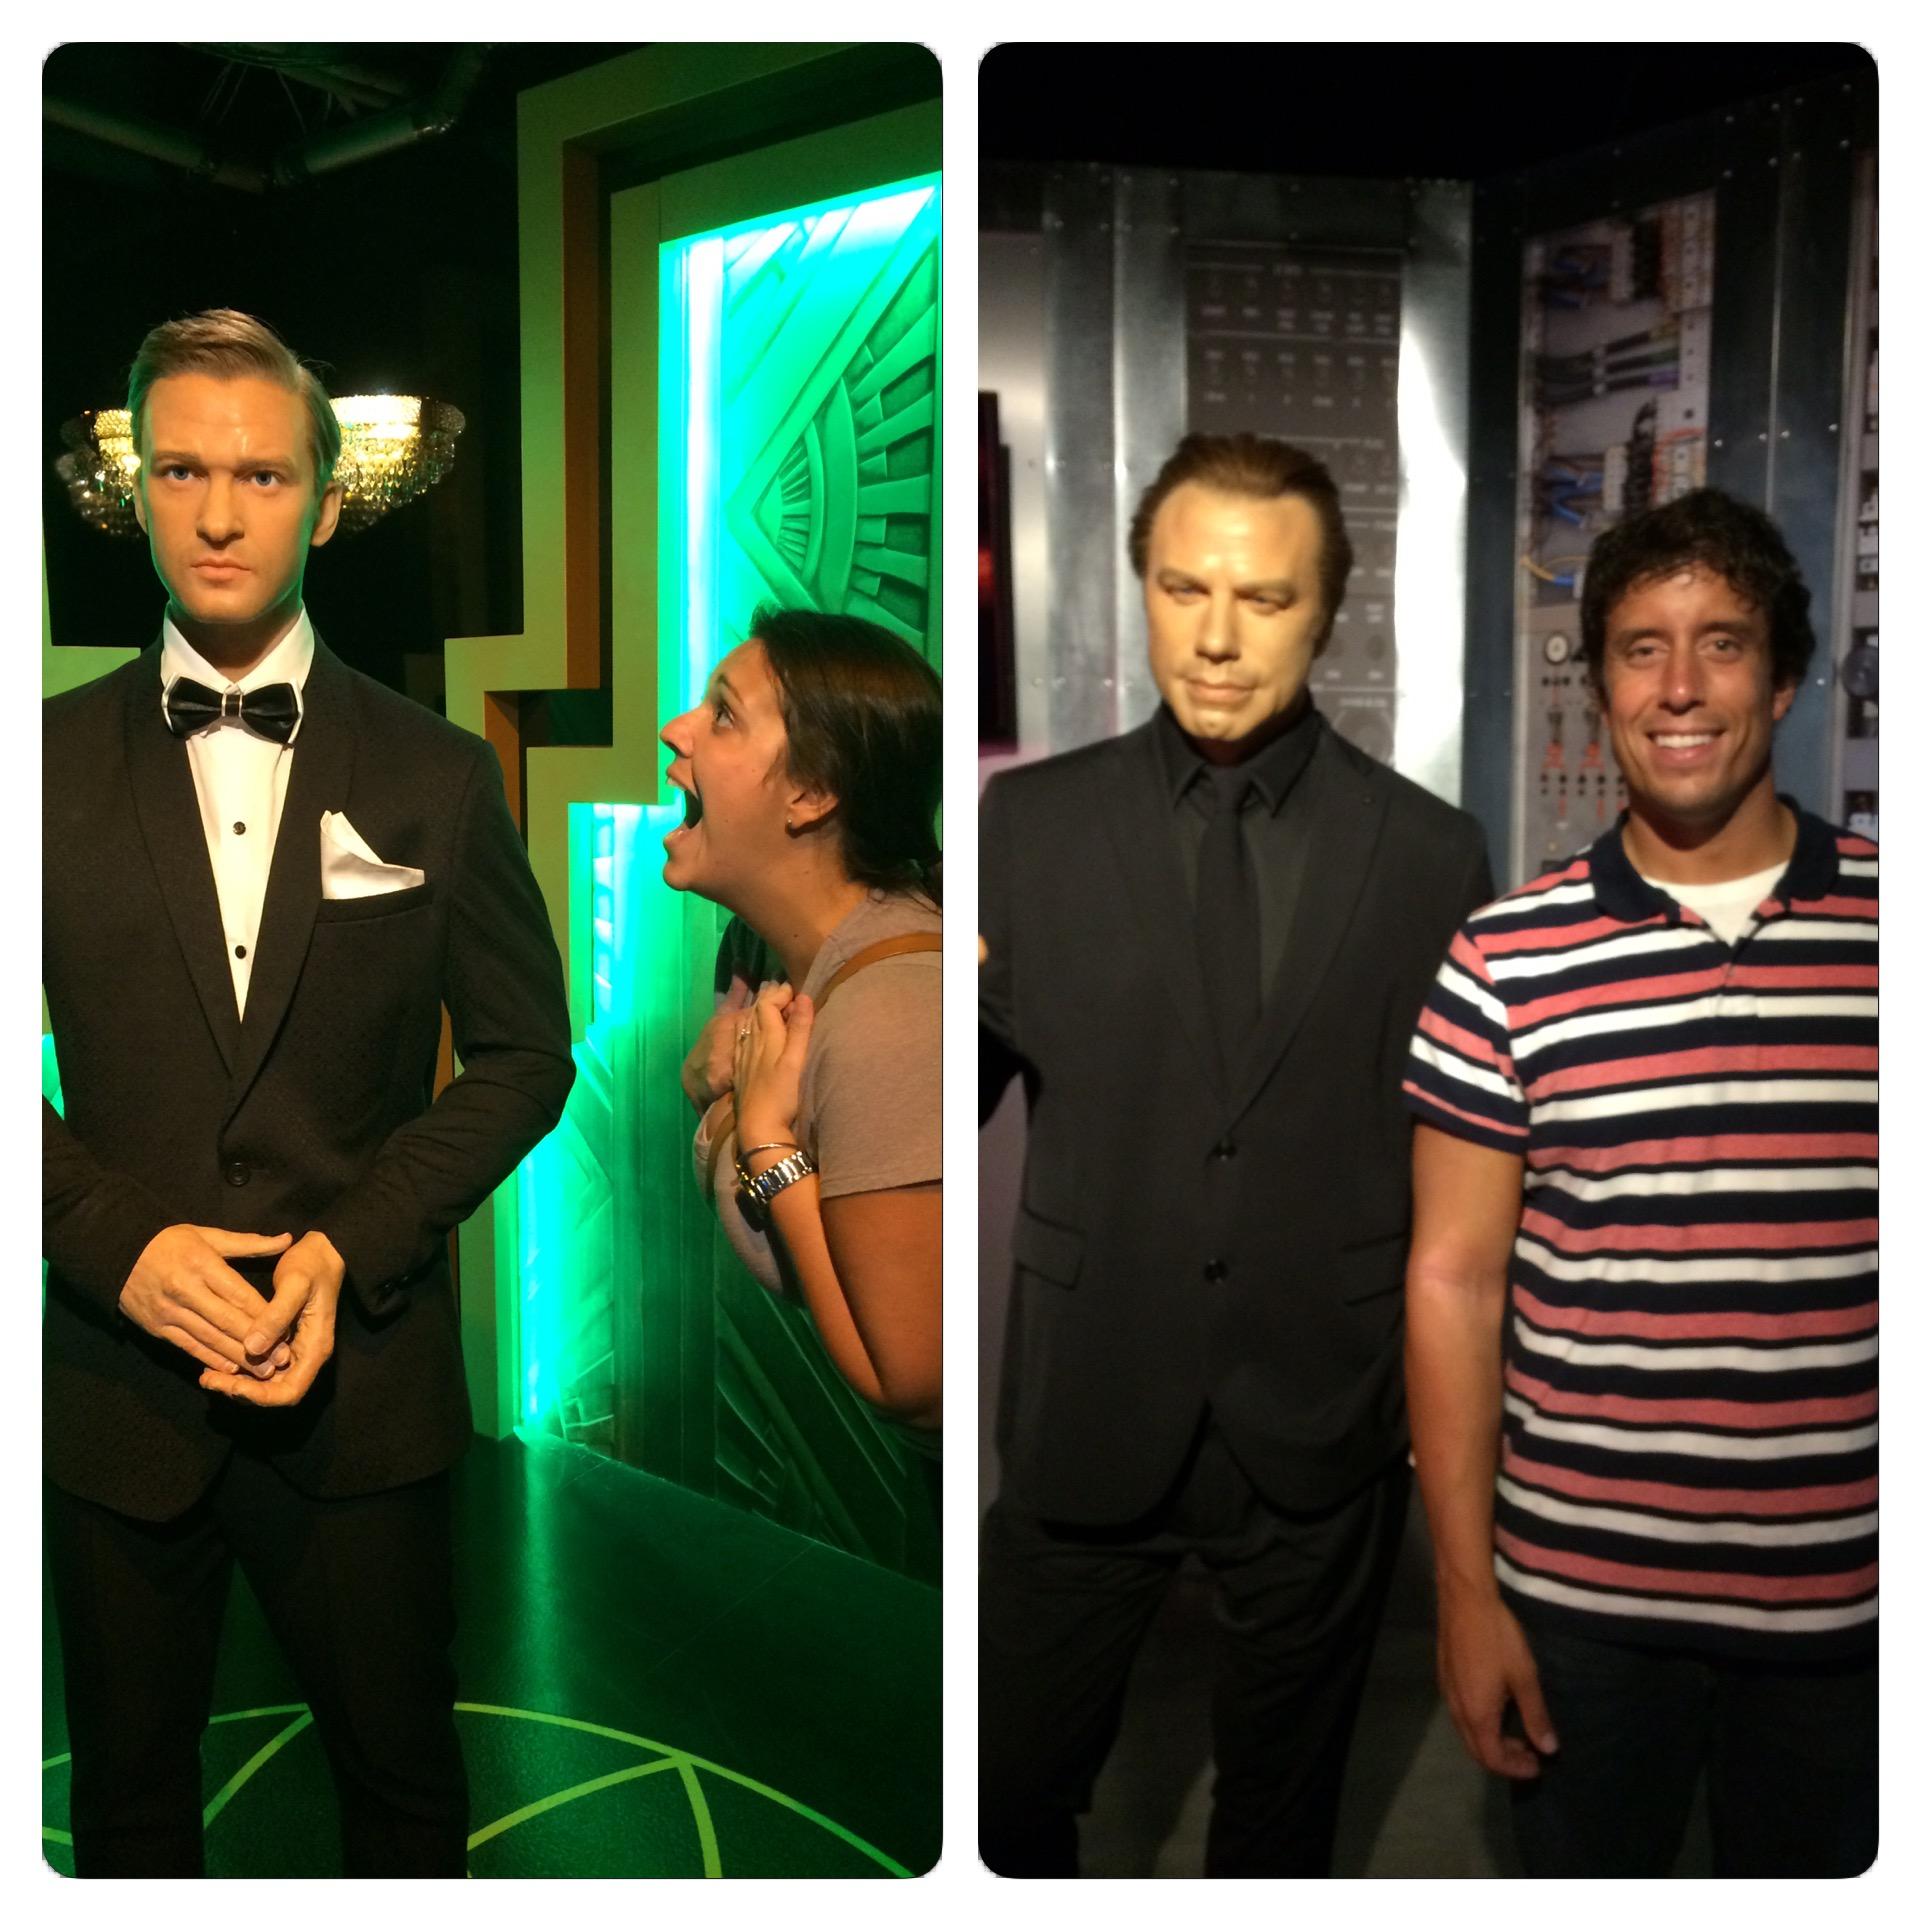 Sidney liked Justin Timberlake and I liked John Travolta.